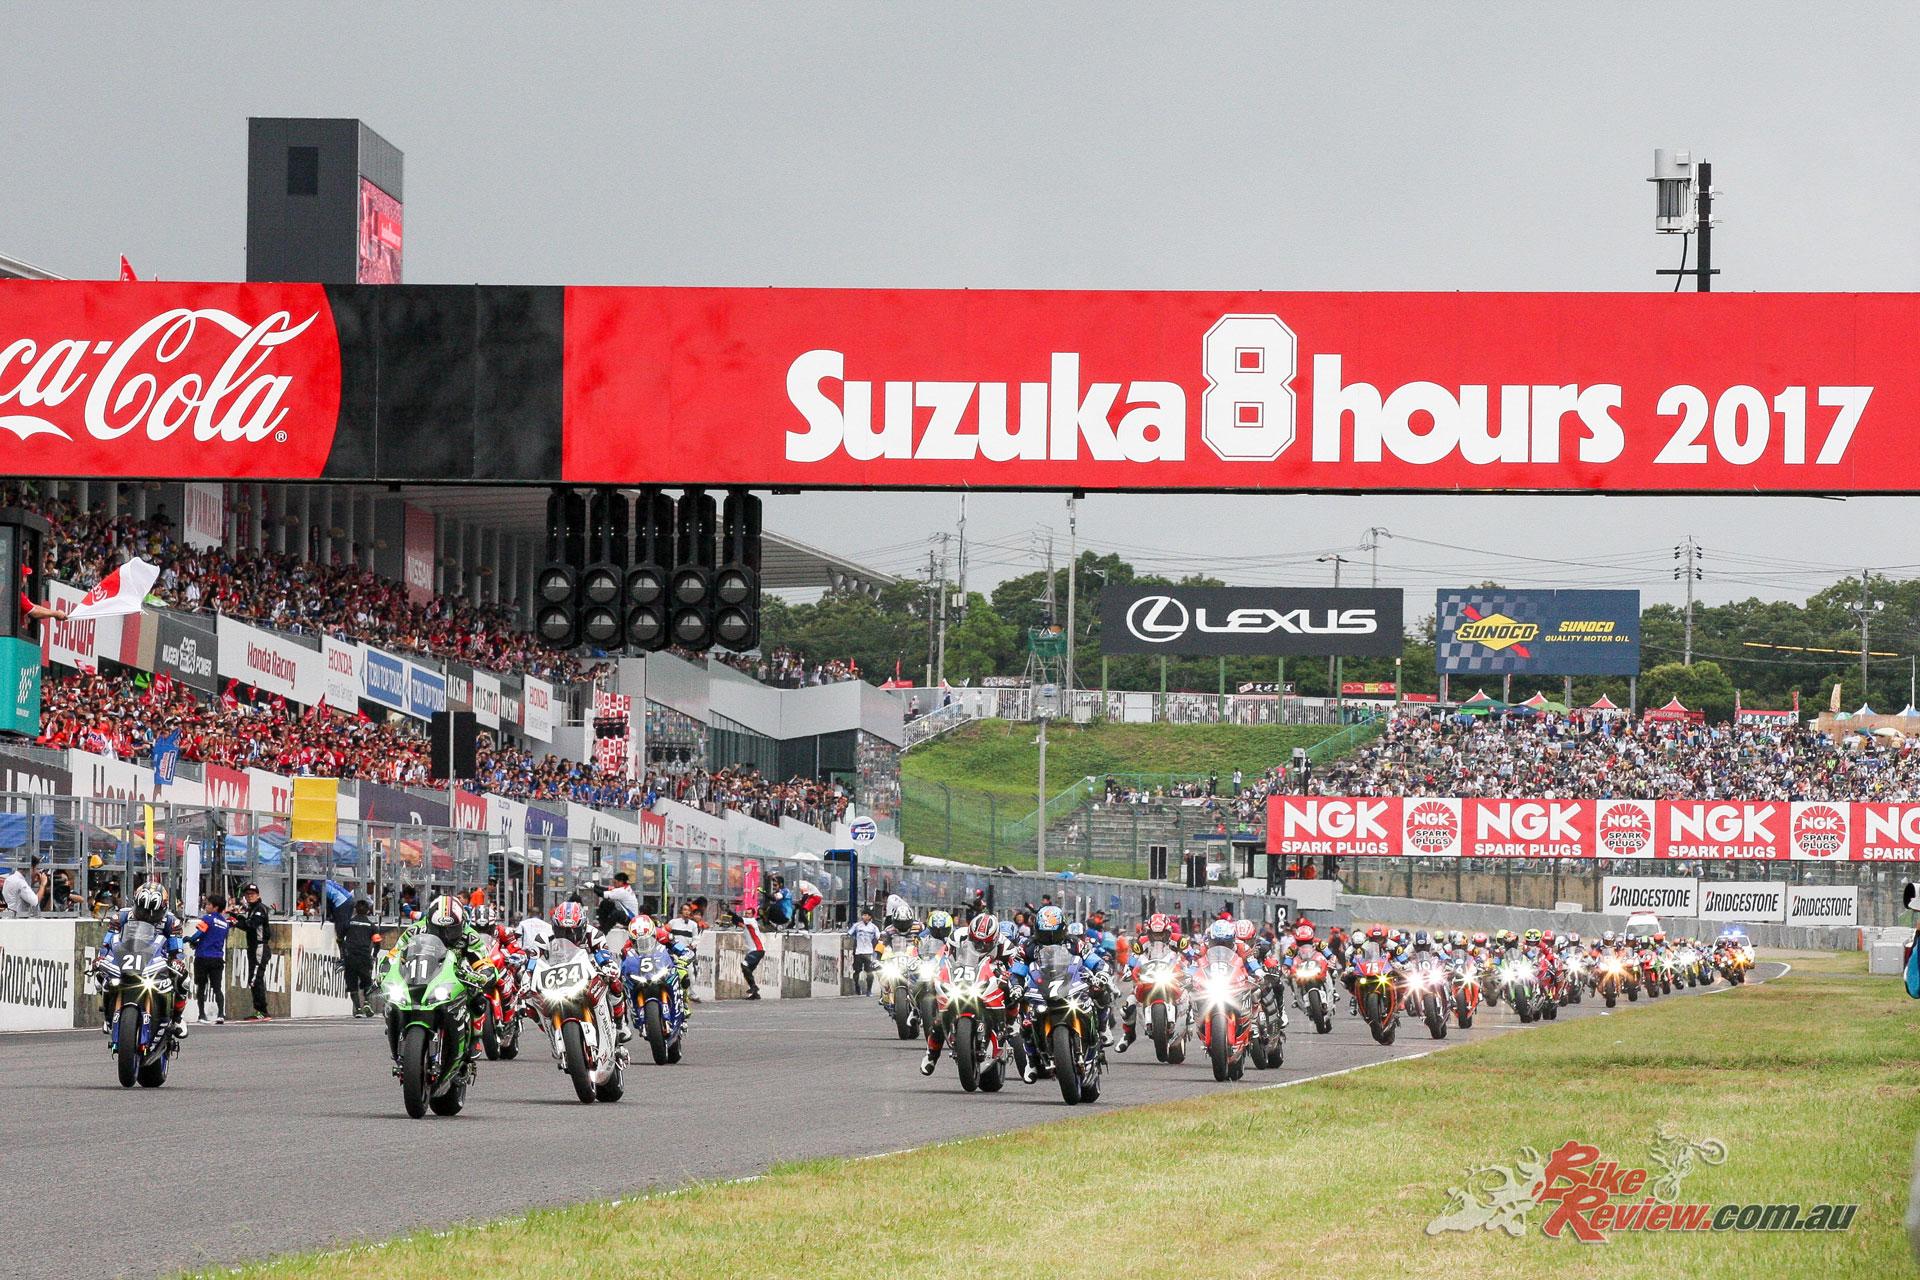 EWC returns to the Suzuka 8 Hours for the season finale